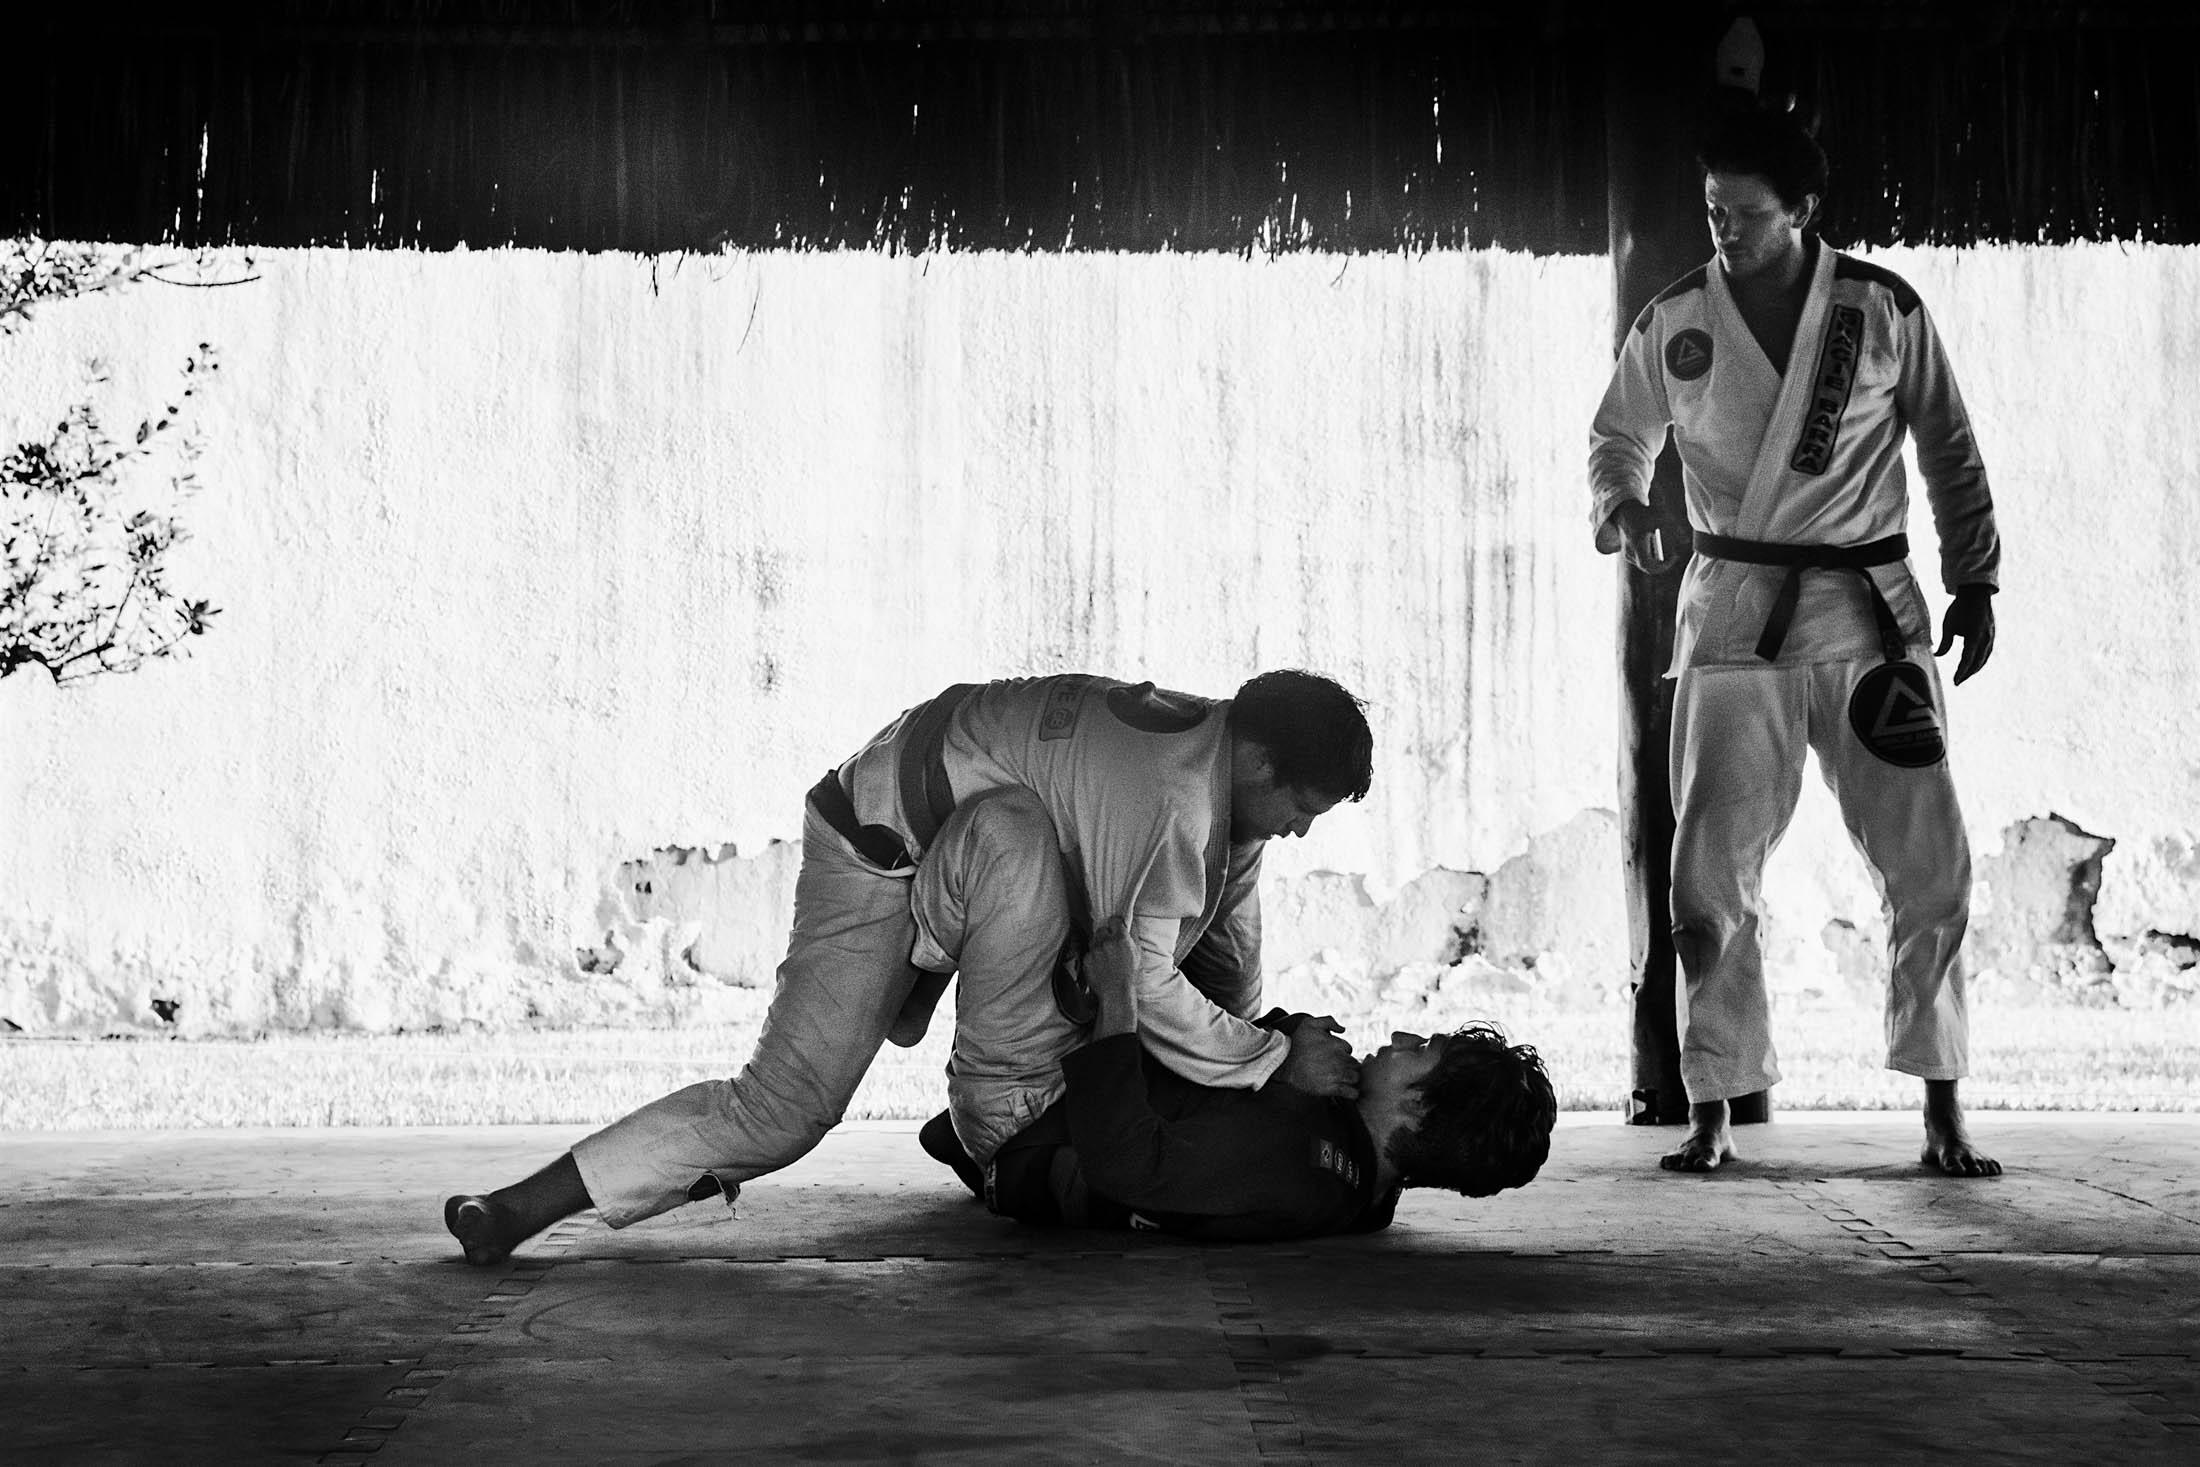 See The Intense Training Regimens Of Brazilian Jiujitsu